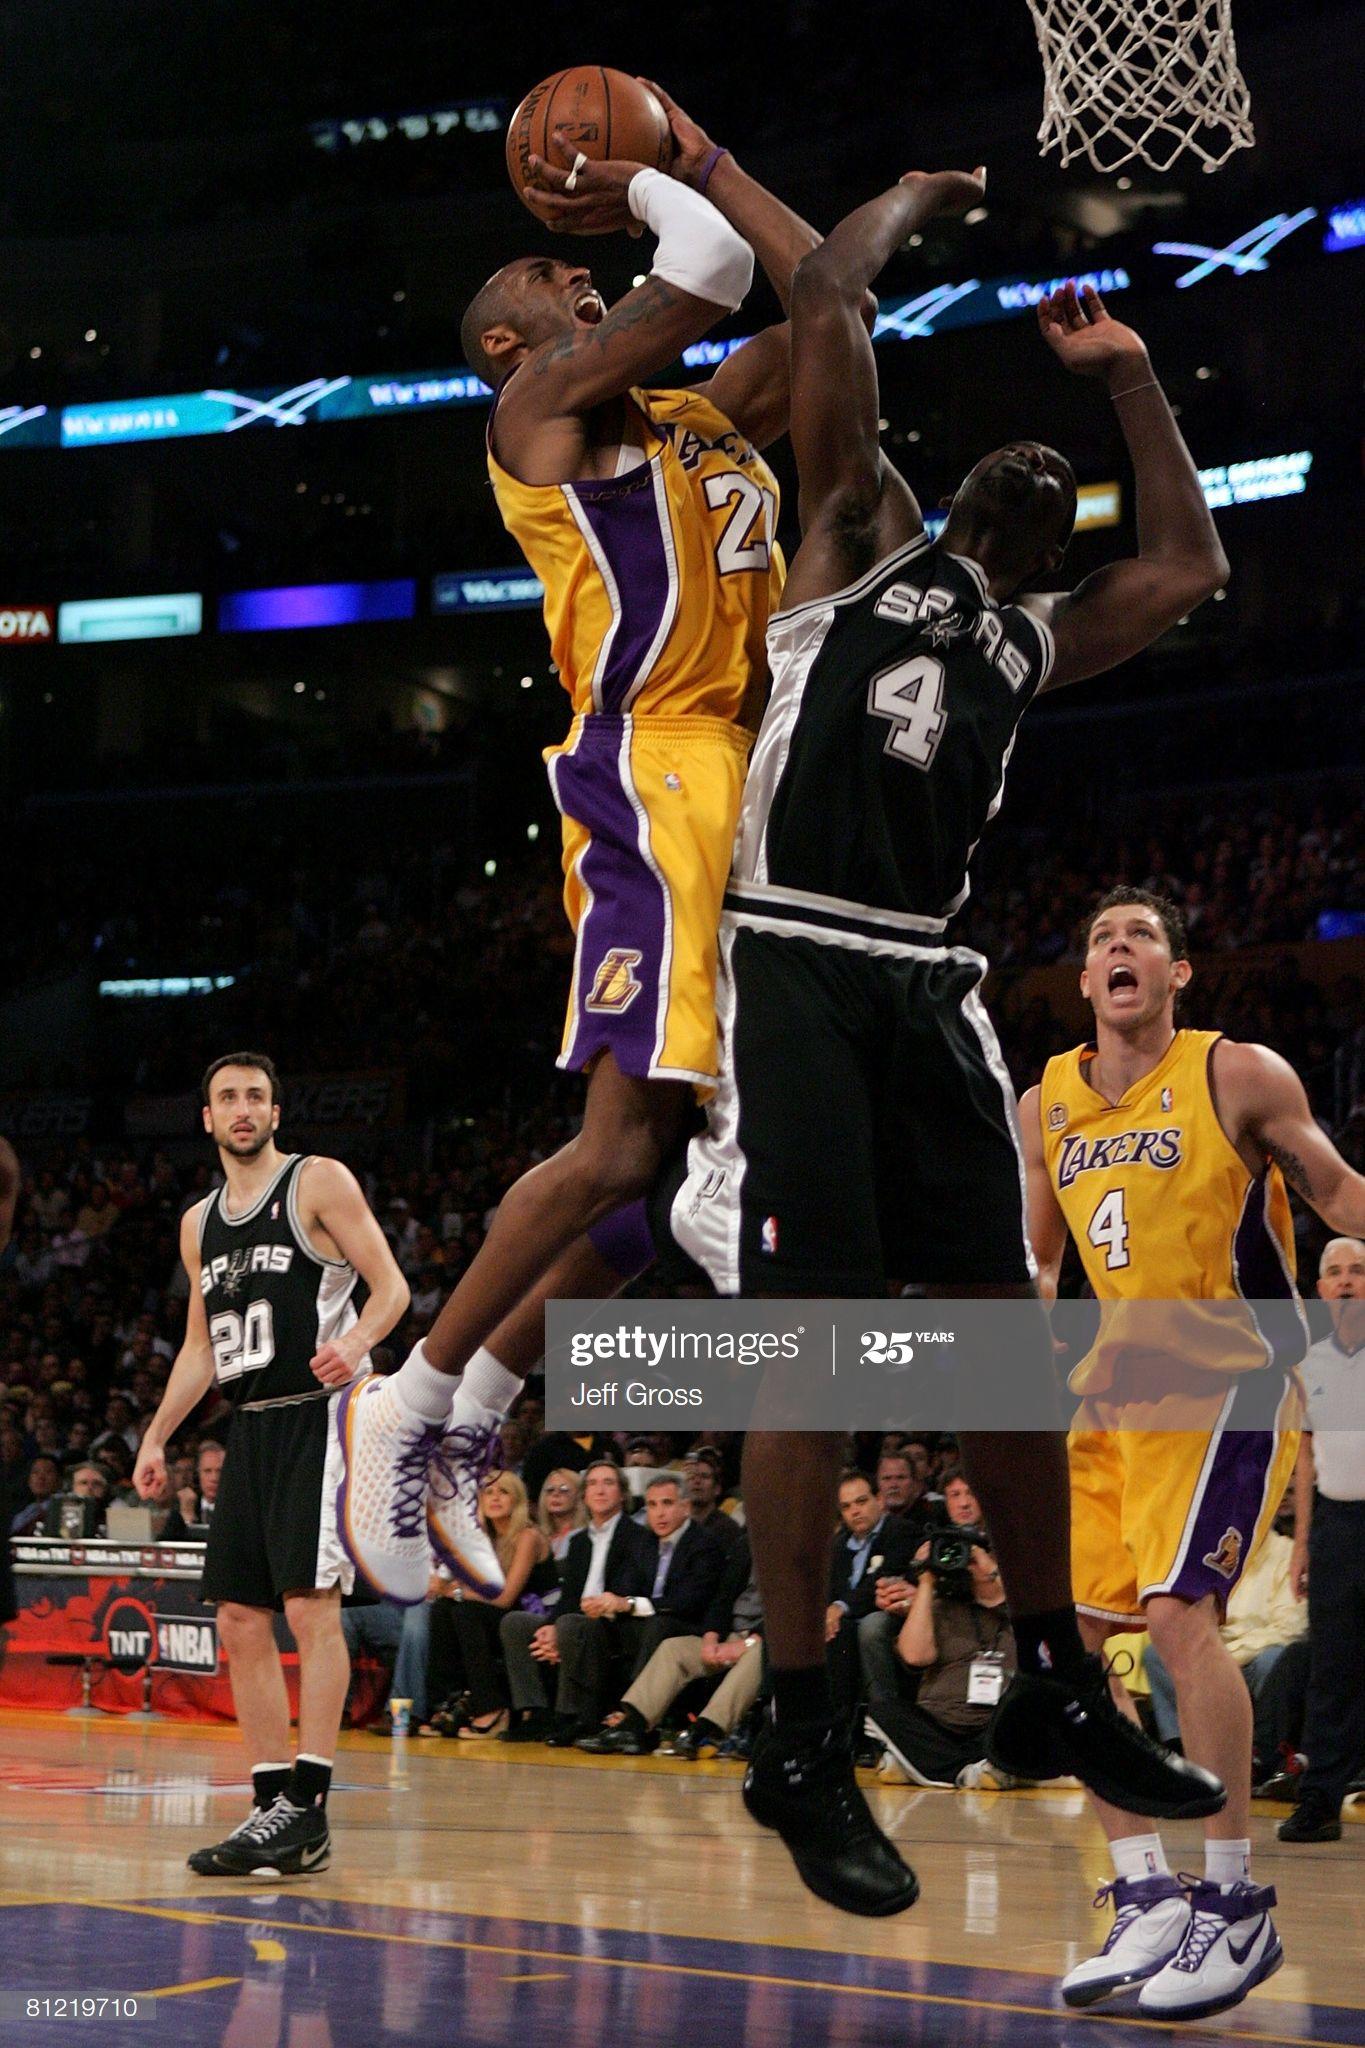 Fotografia De Noticias Kobe Bryant Of The Los Angeles Lakers Goes To The Em 2020 Kobe Bryant San Antonio Spurs Los Angeles Lakers